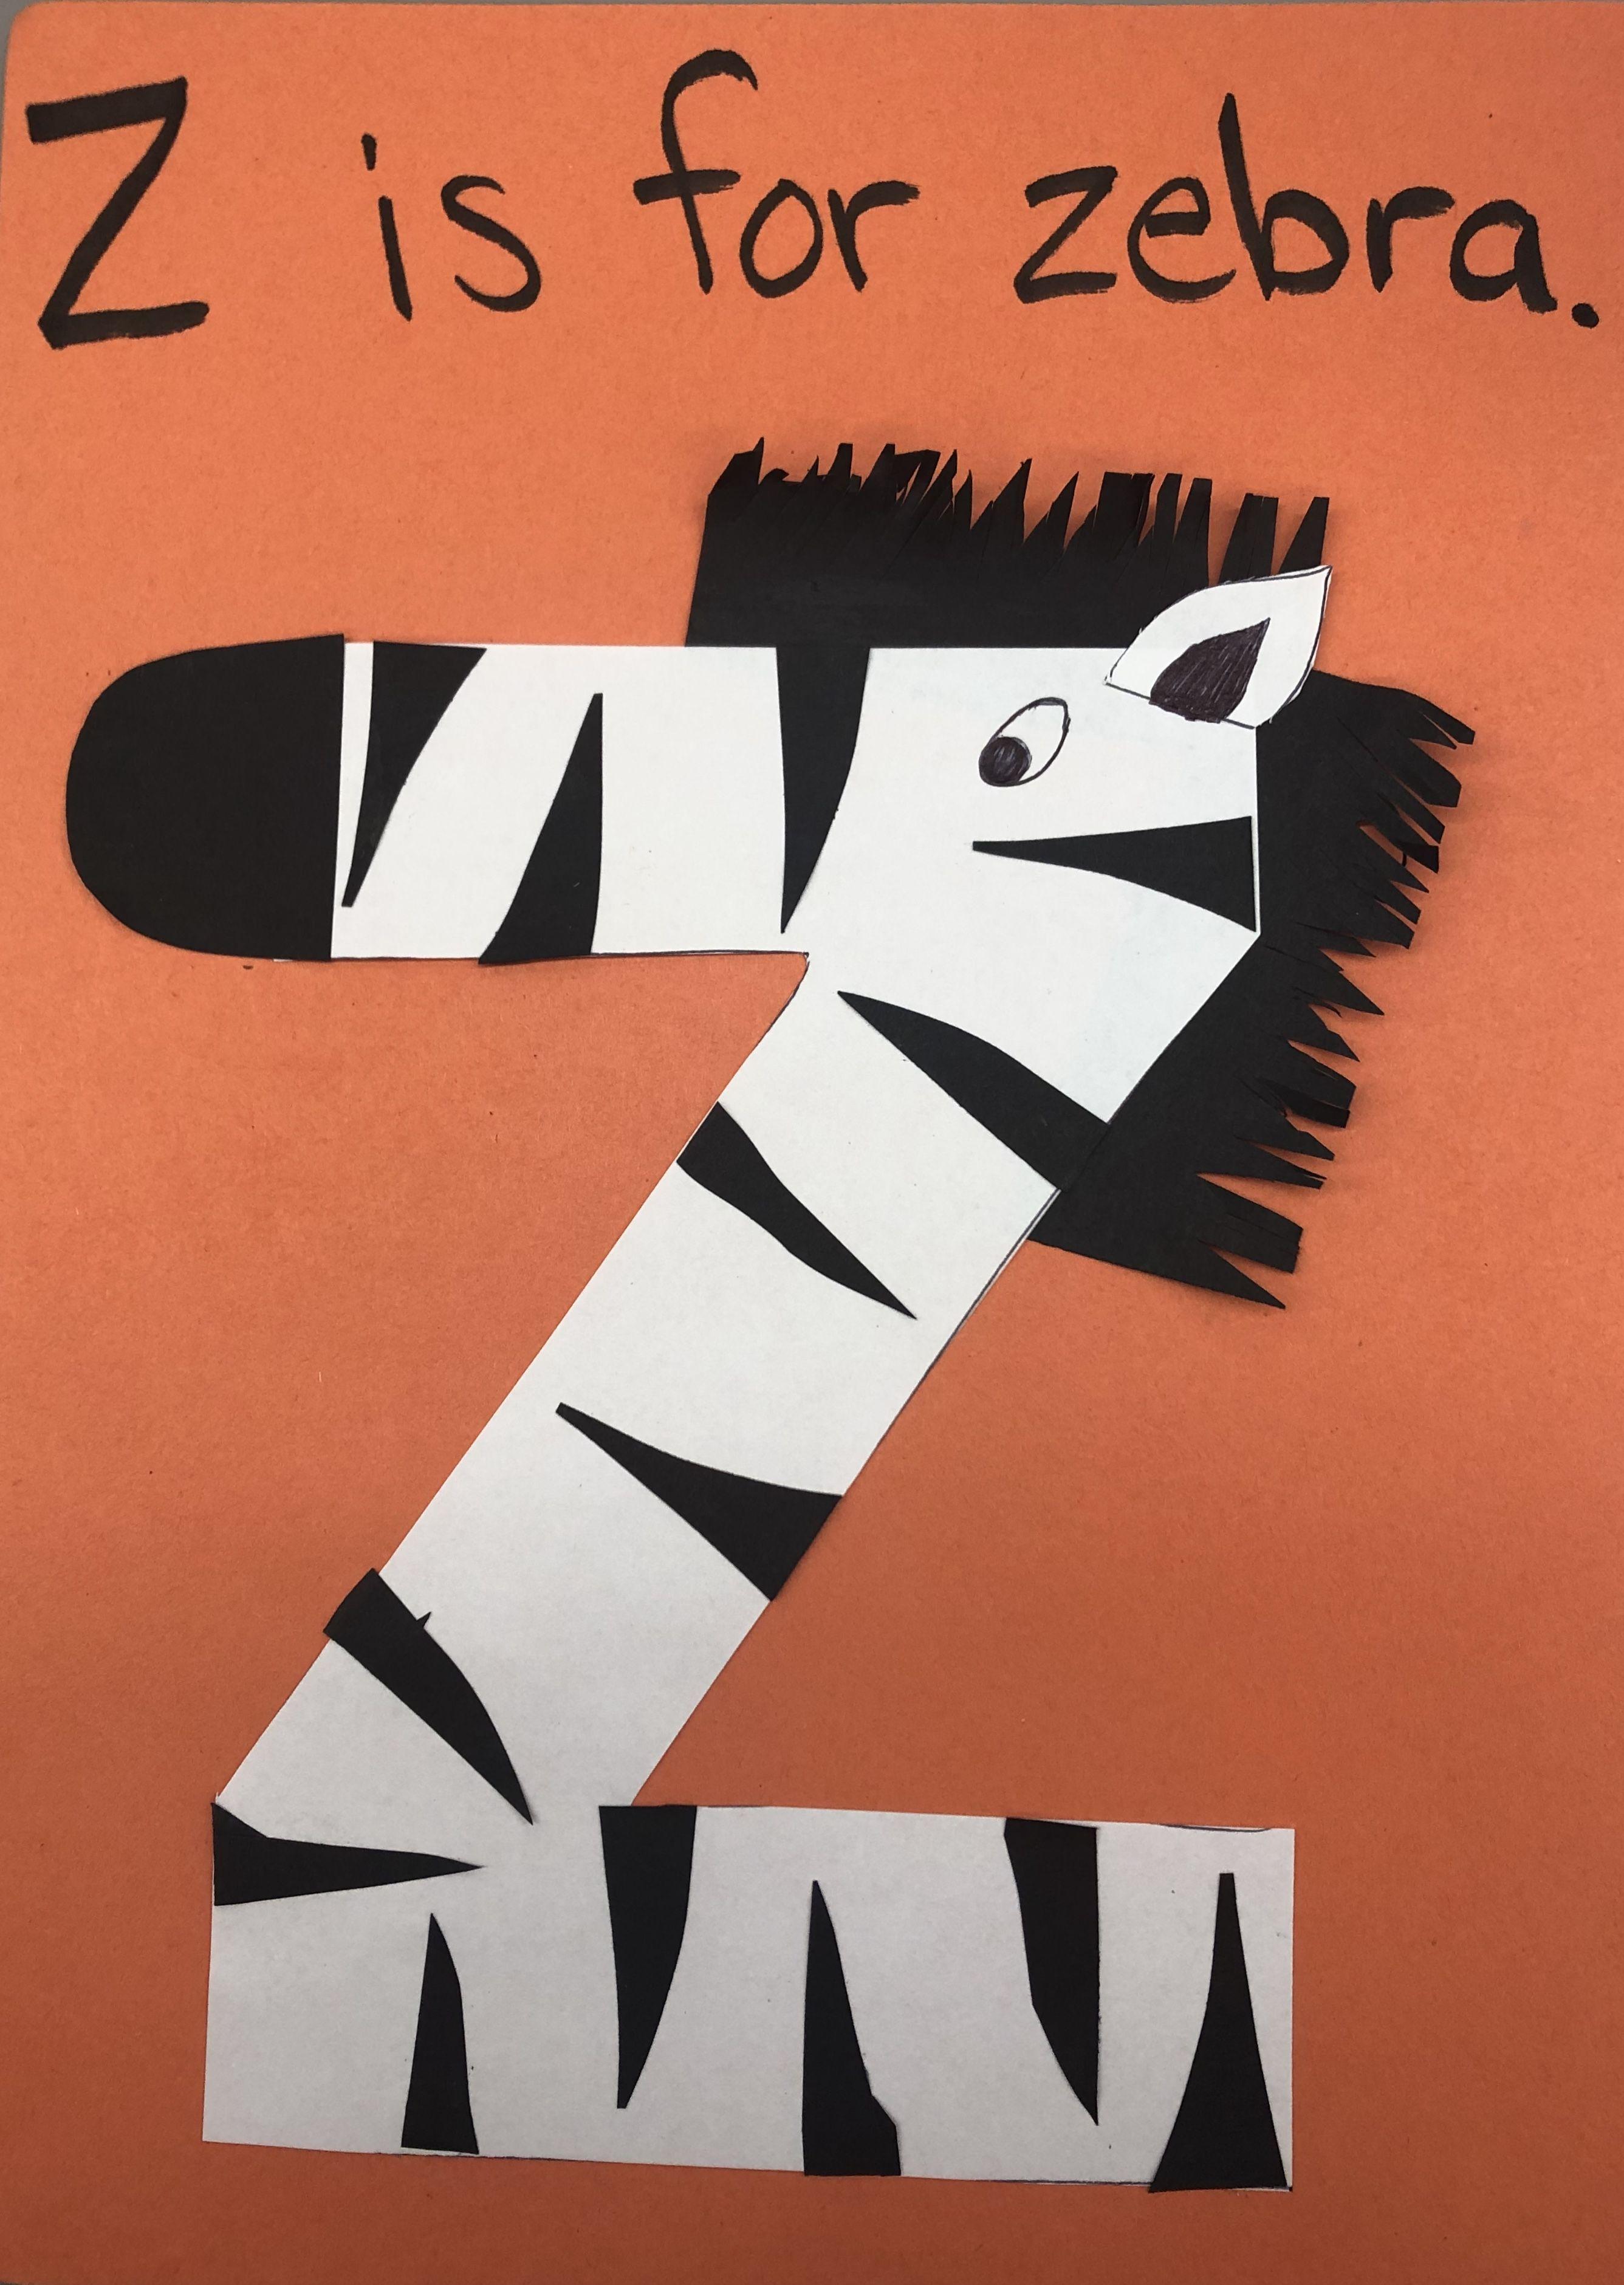 Preschool Letter Of The Week Craft Letter Z Zebra Made